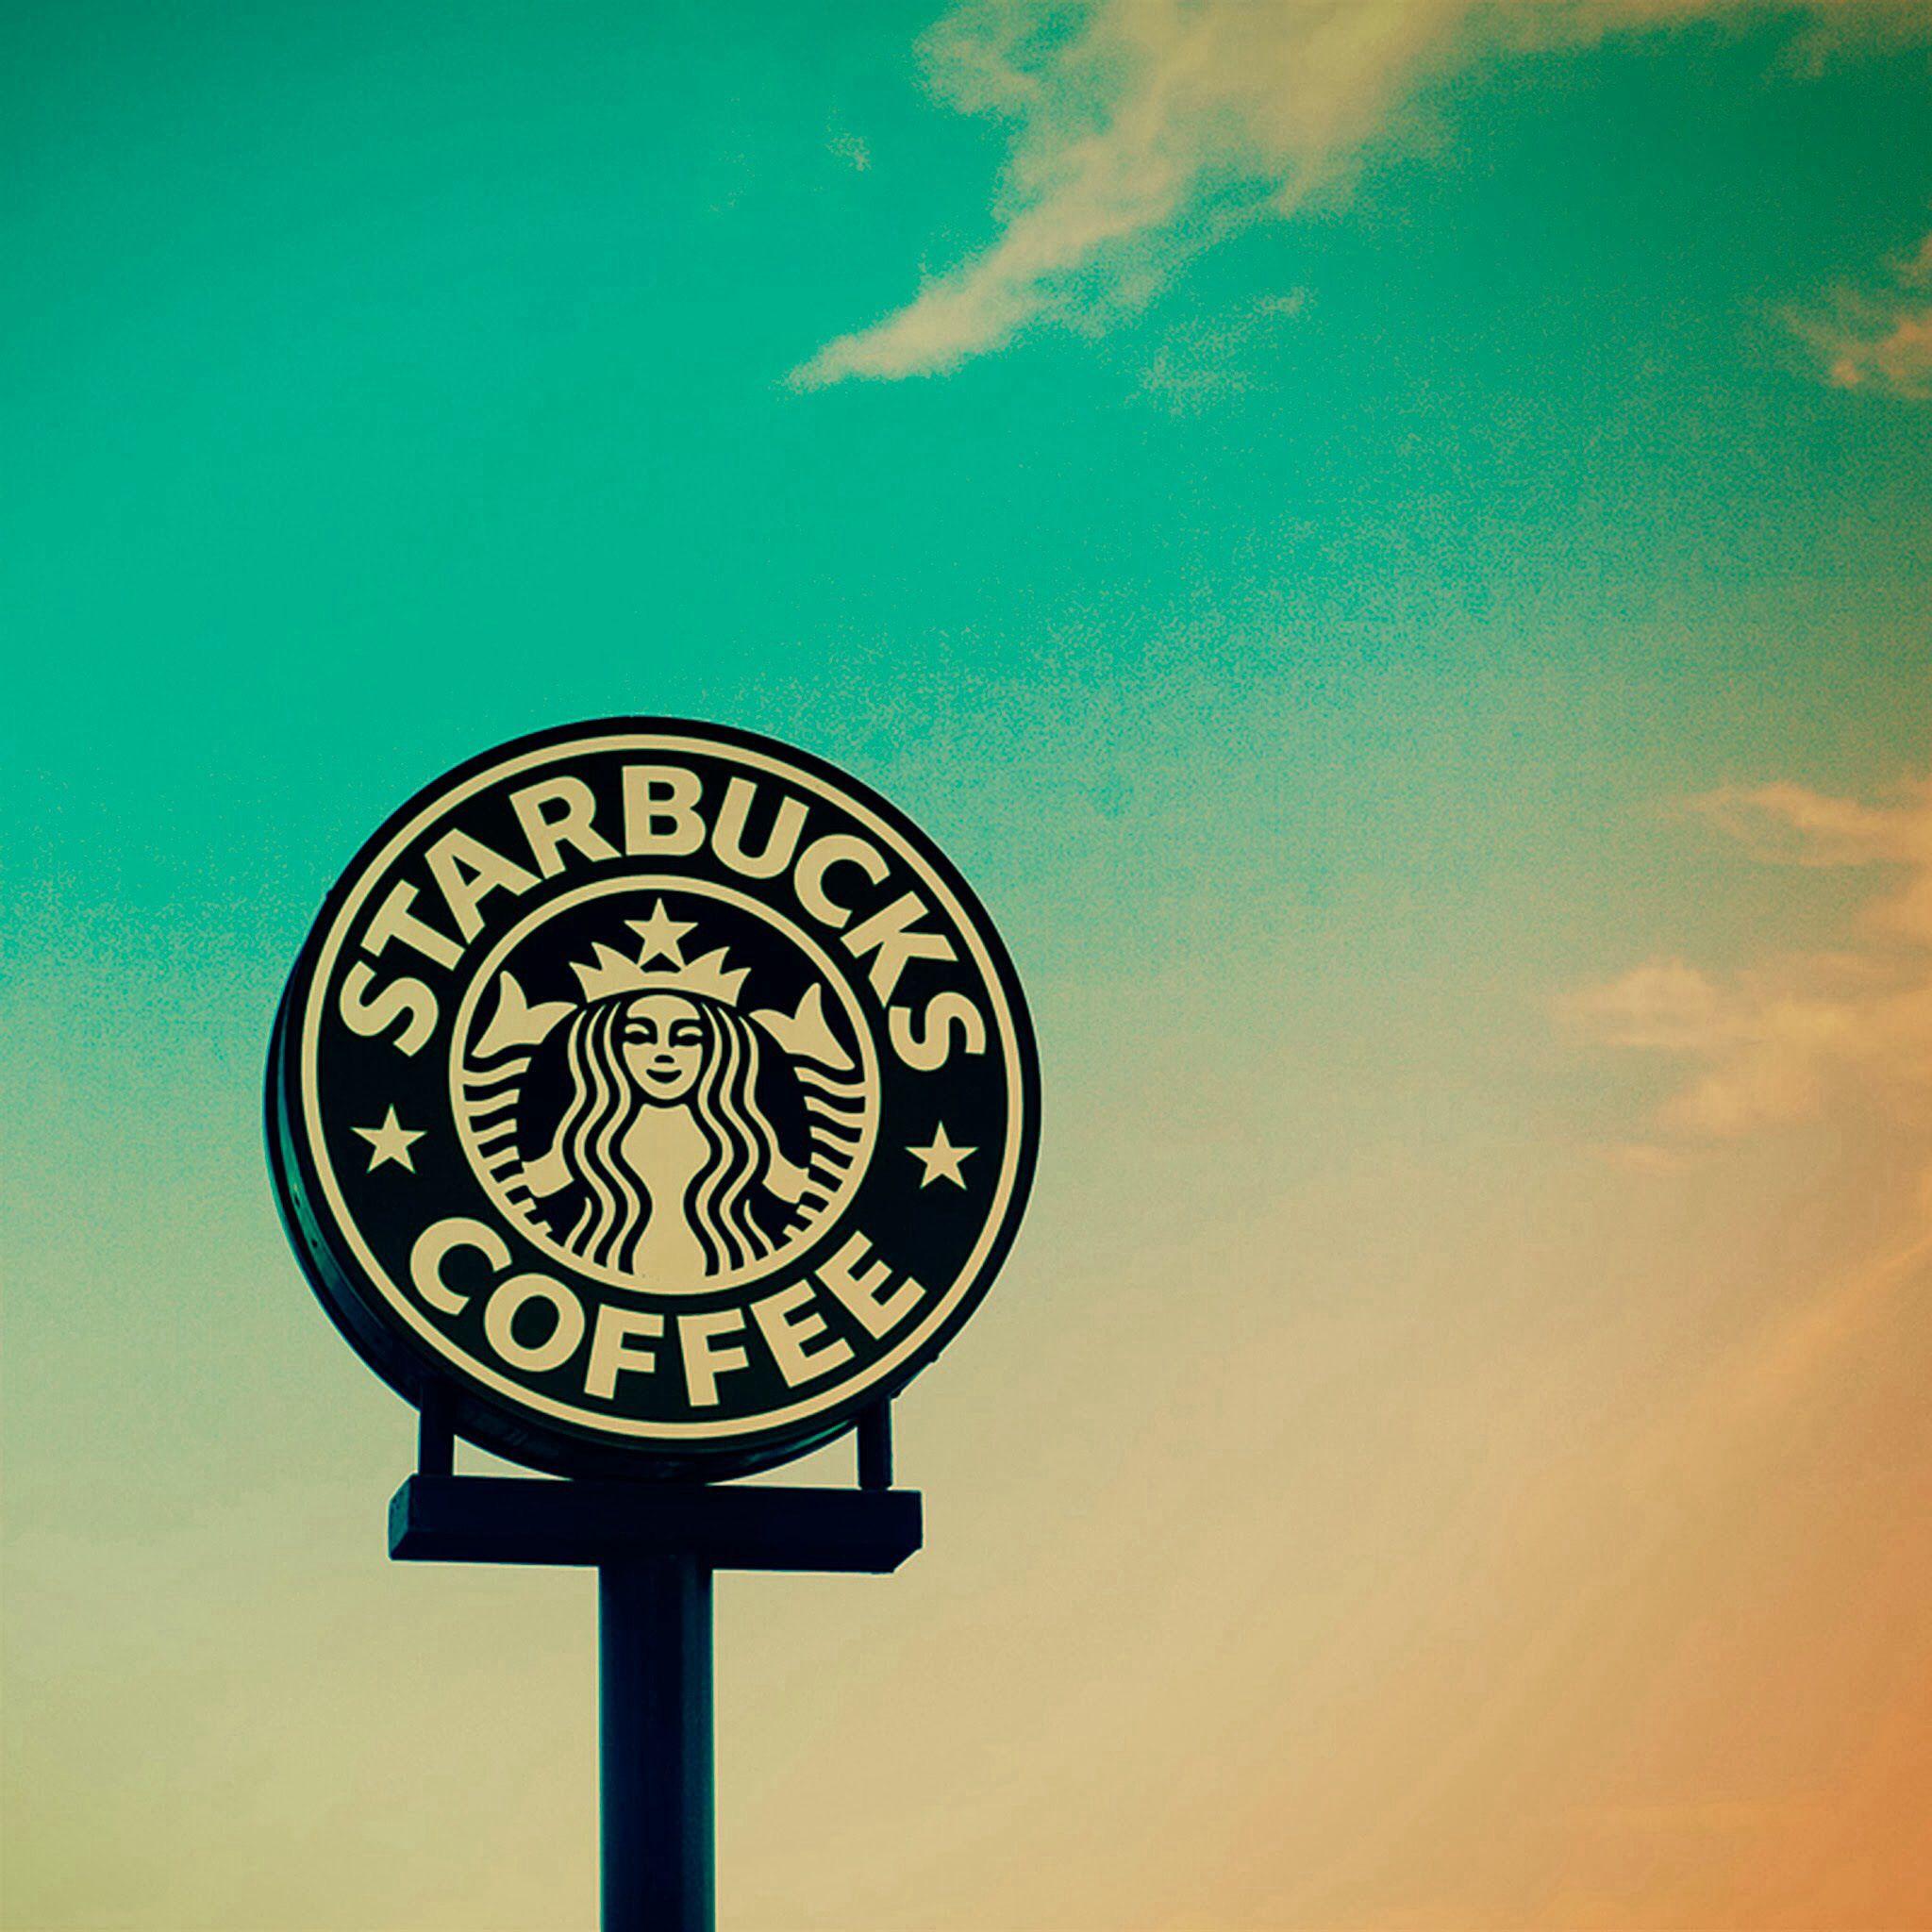 Favorite Starbucks Drink